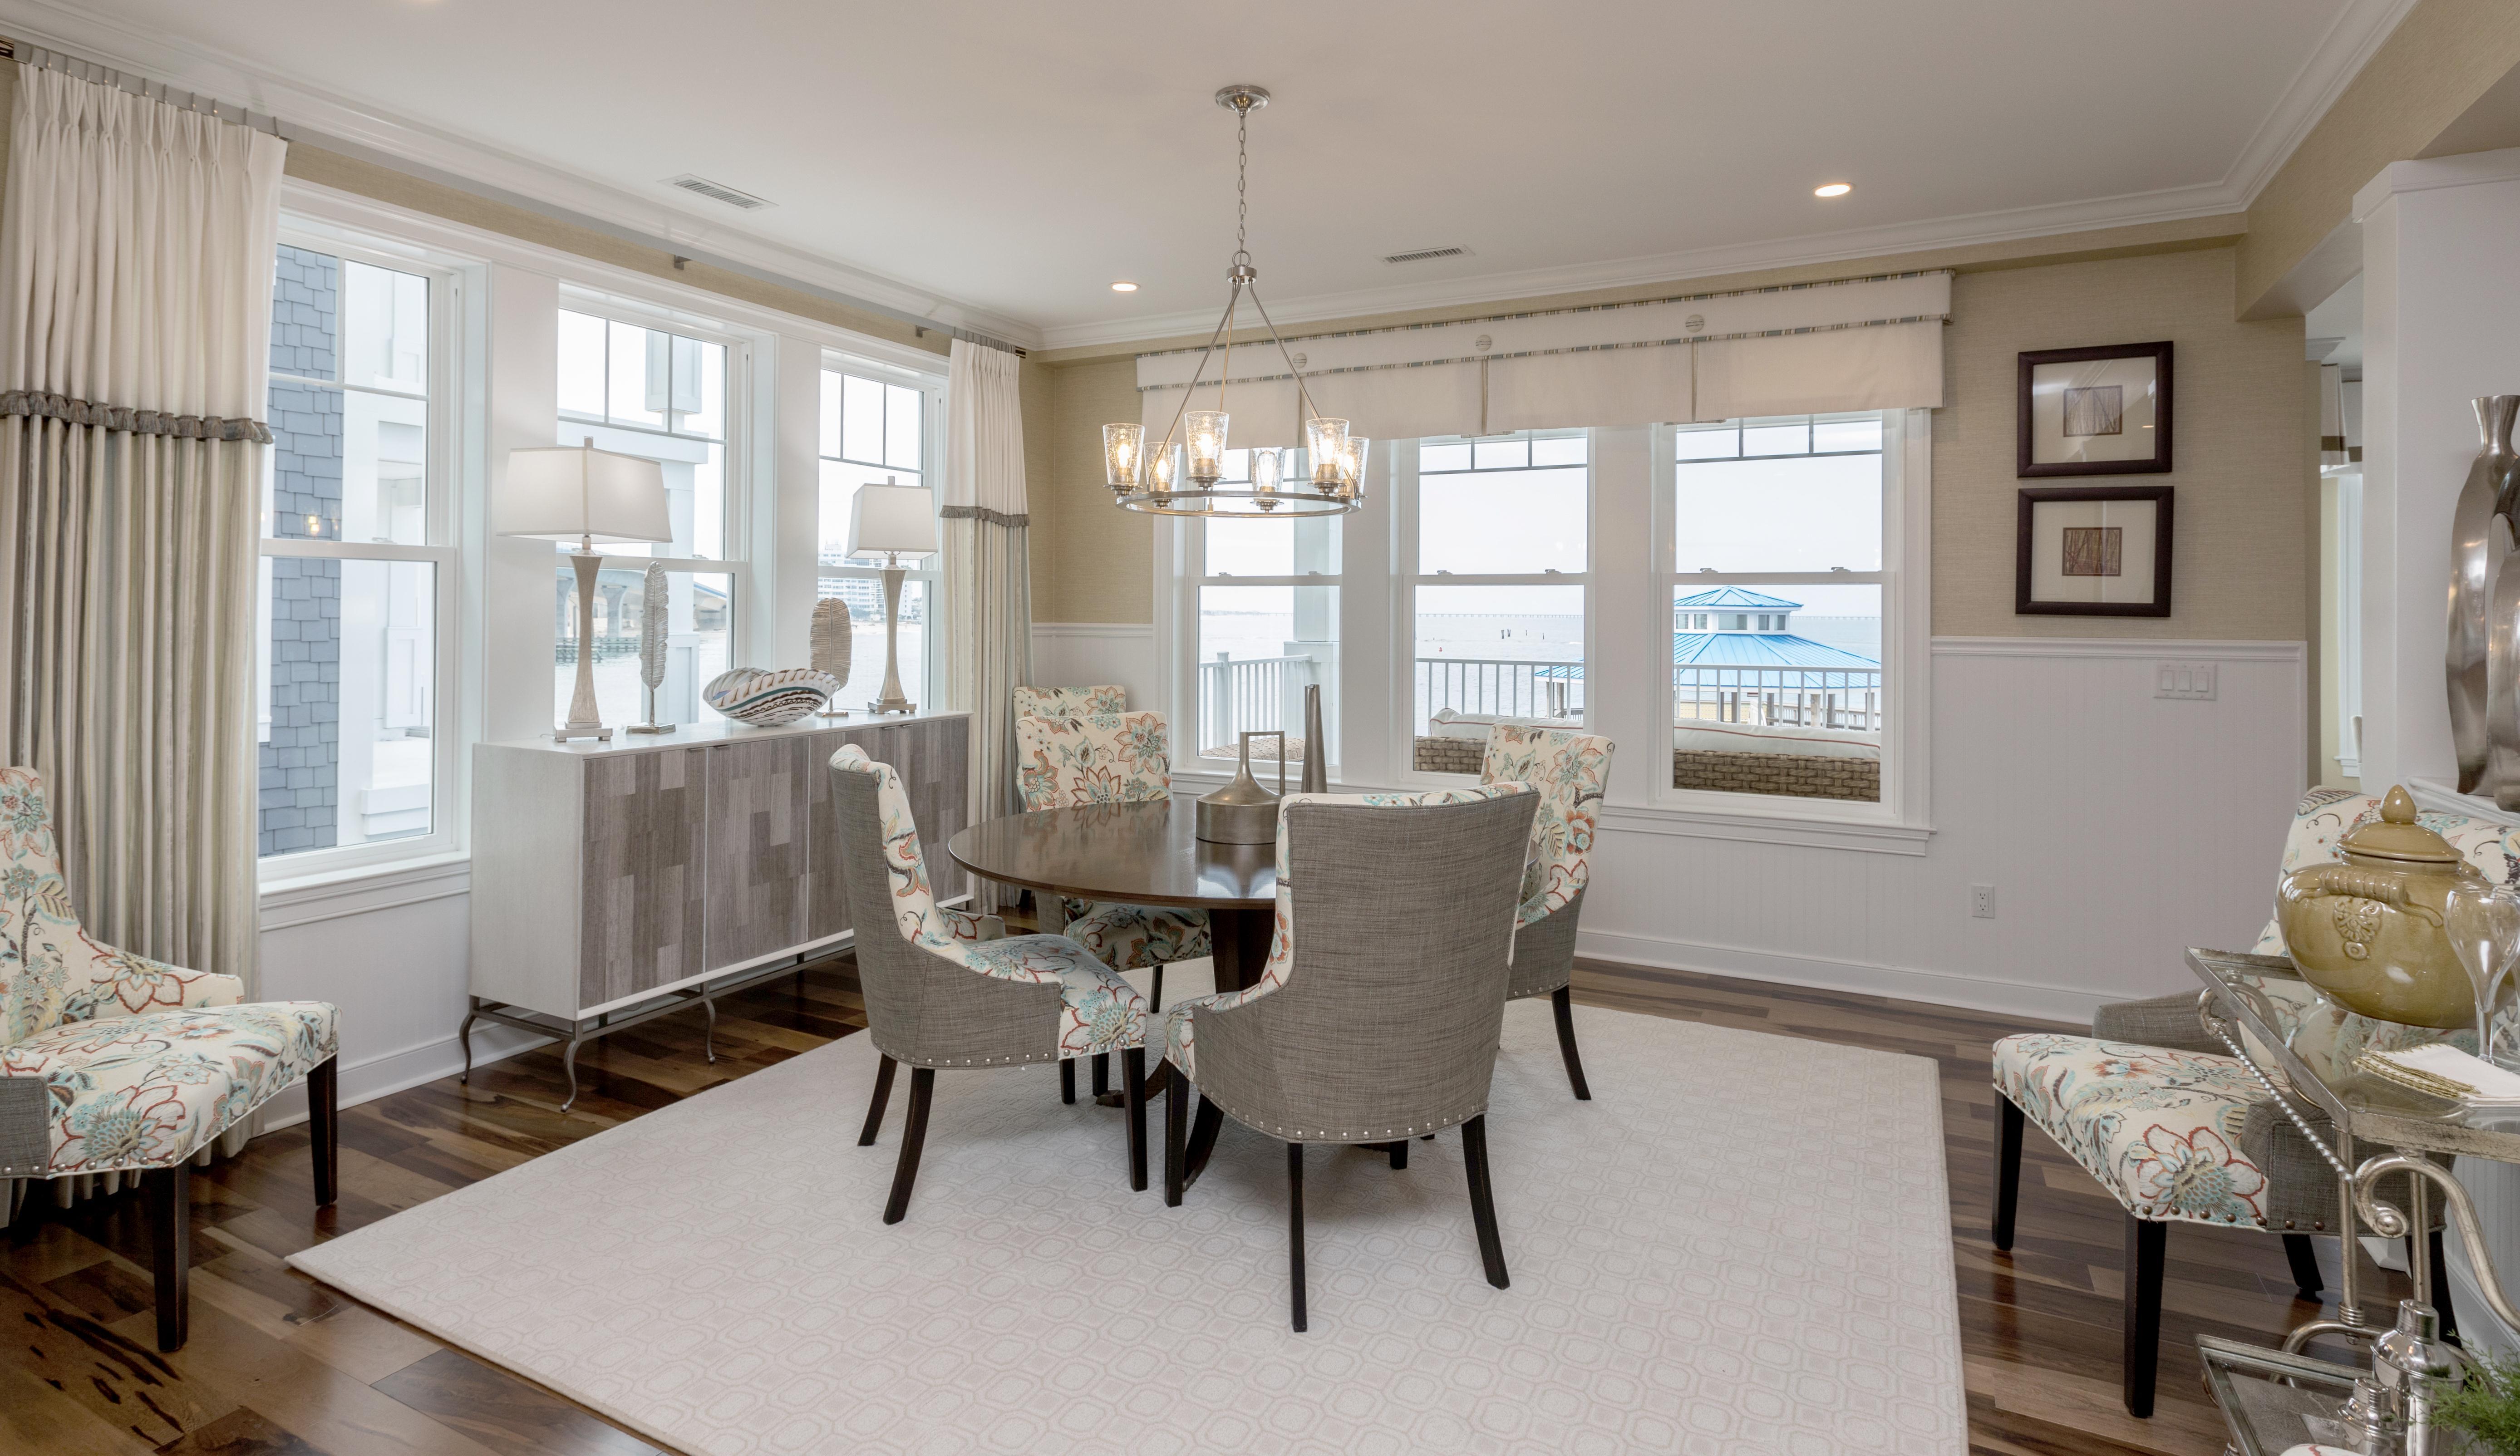 Kitchen featured in The Aurora By Napolitano Homes in Norfolk-Newport News, VA